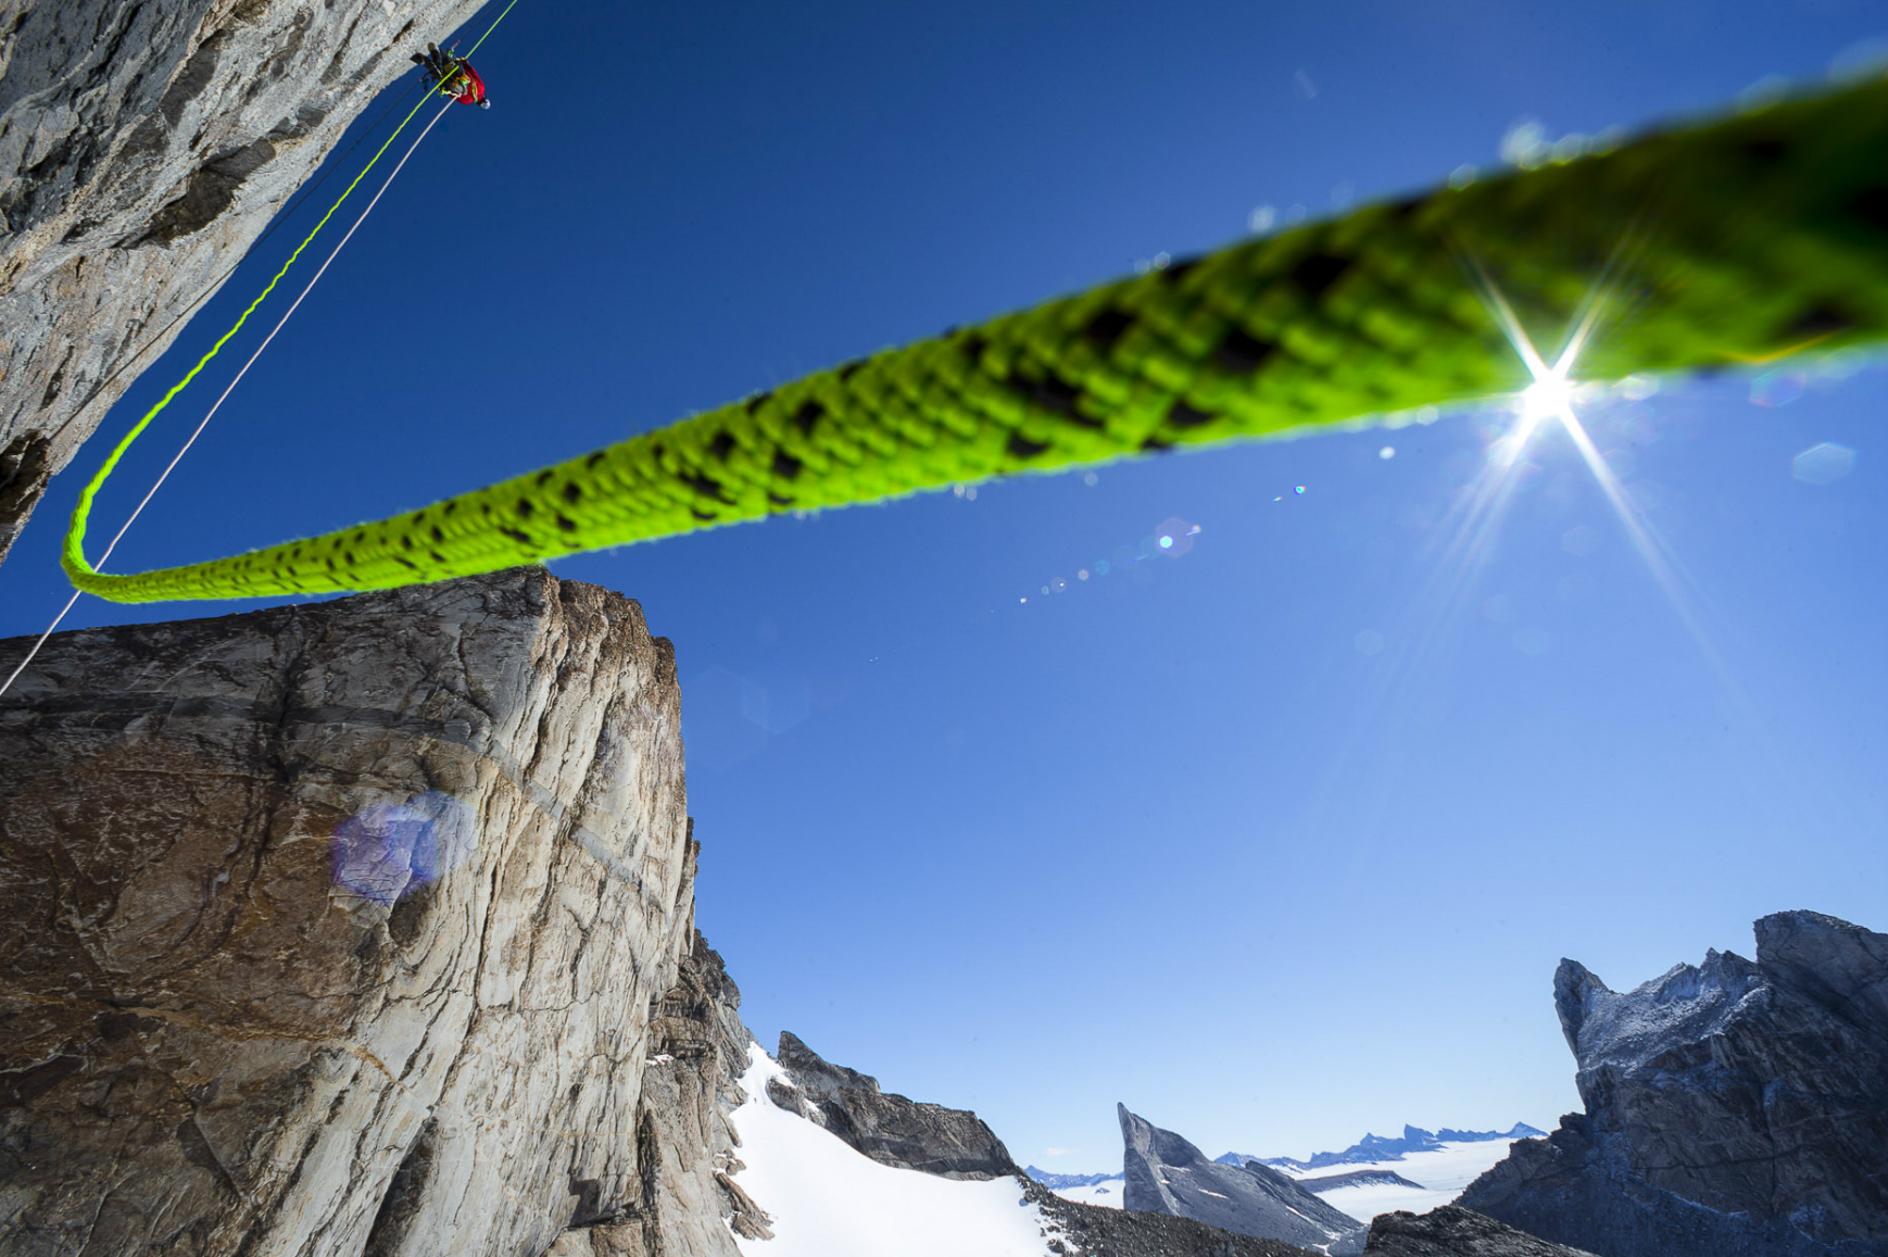 Cory-Richards-Photographer-Antarctica-11.jpg